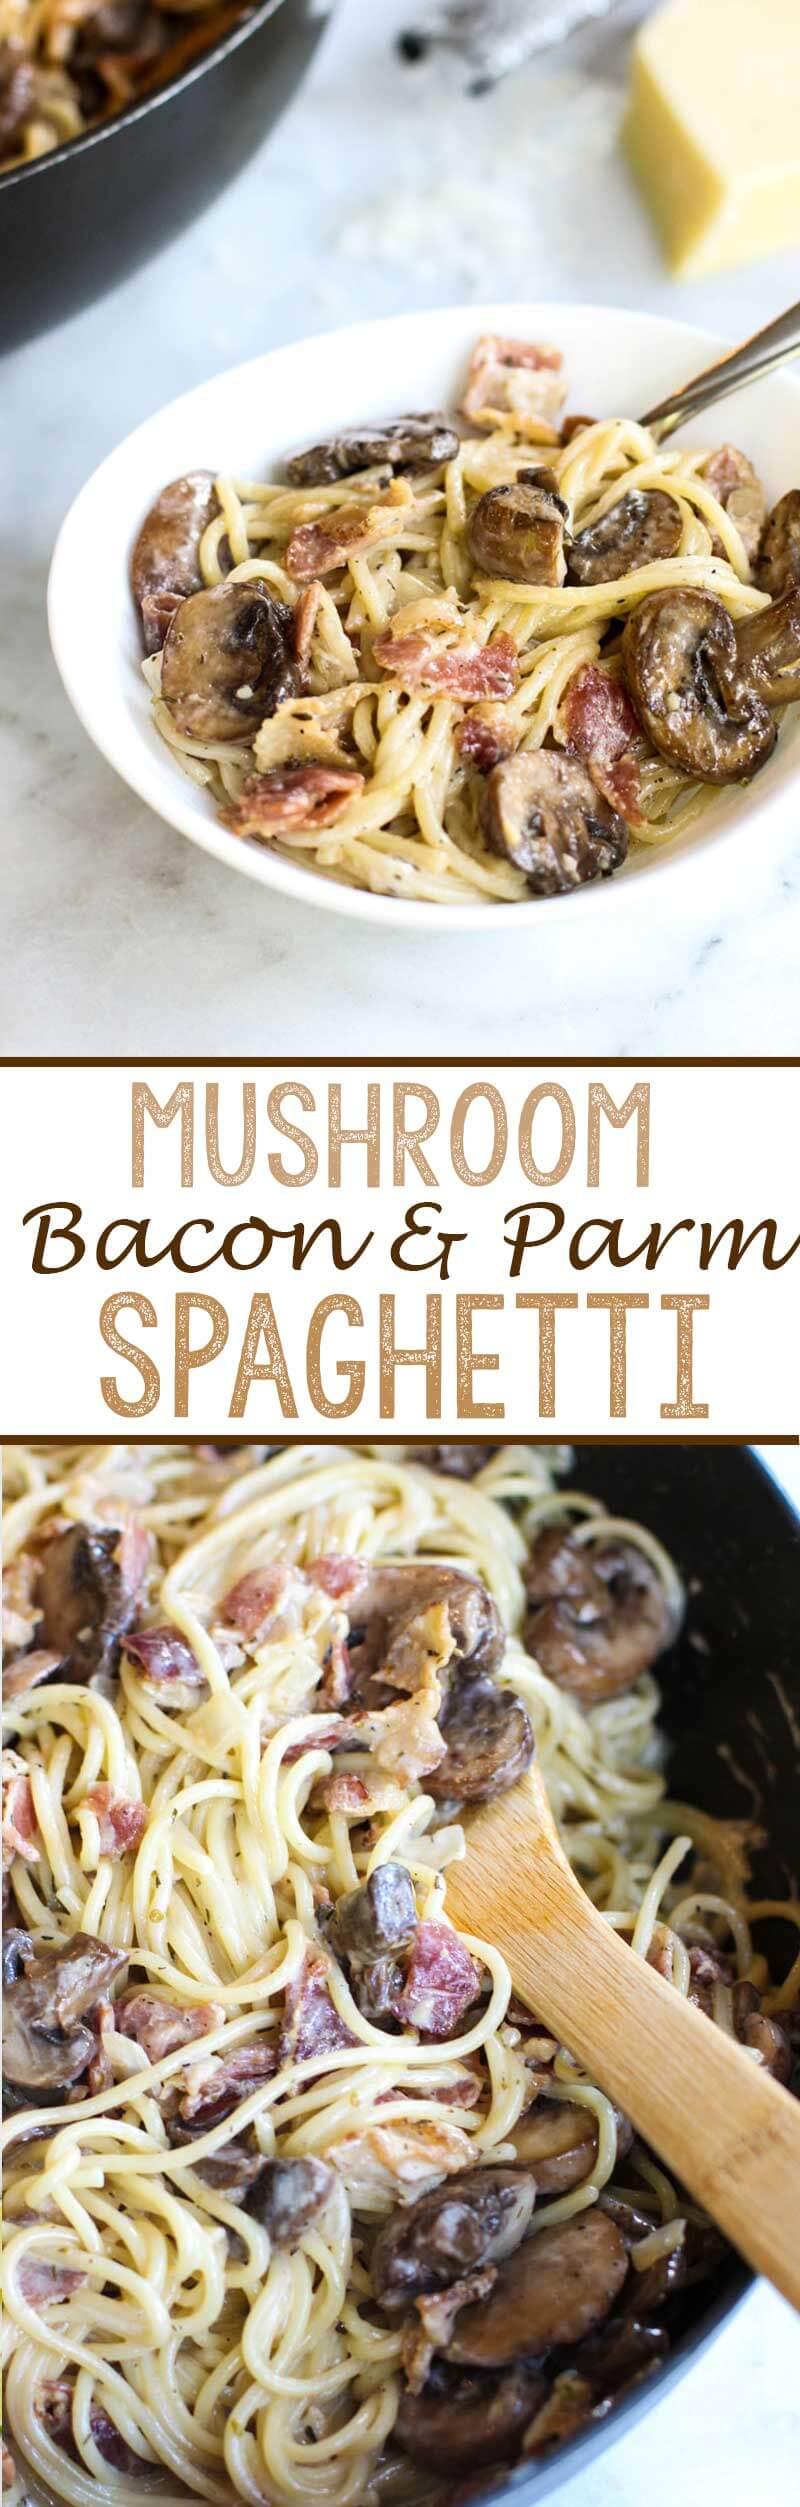 Mushroom bacon and parmesan spaghetti